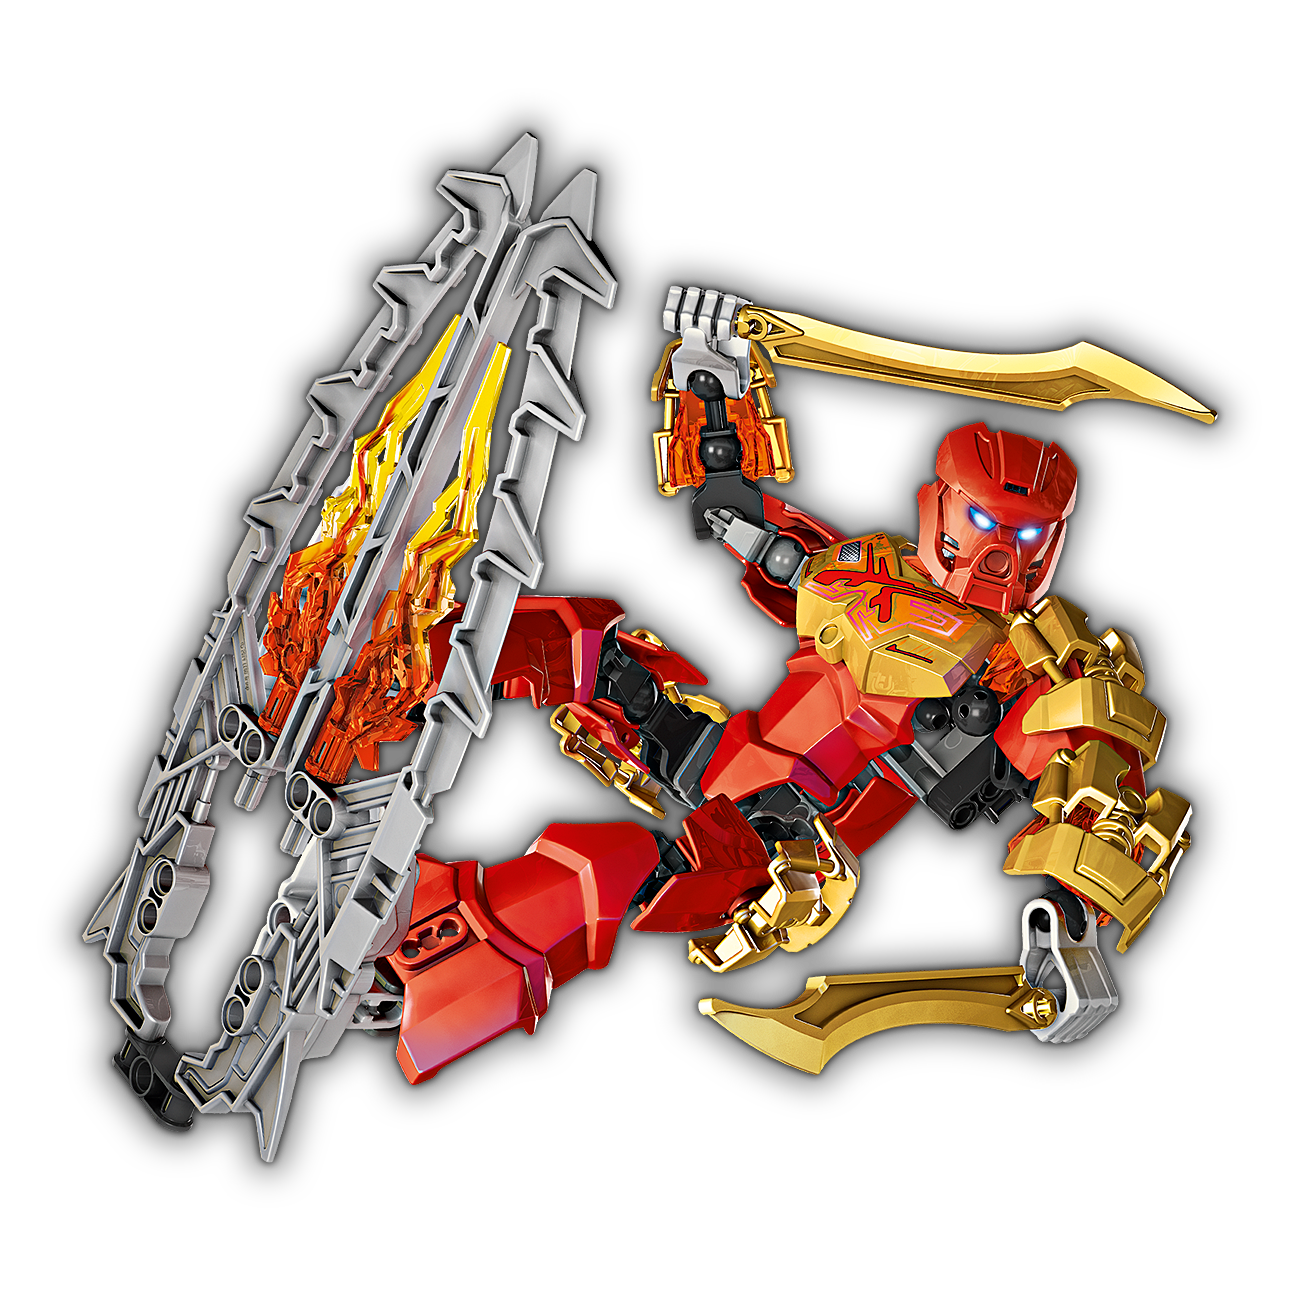 Tahu (2015) - The Bionicle Wiki - The Wikia wiki about ...  Tahu (2015) - T...